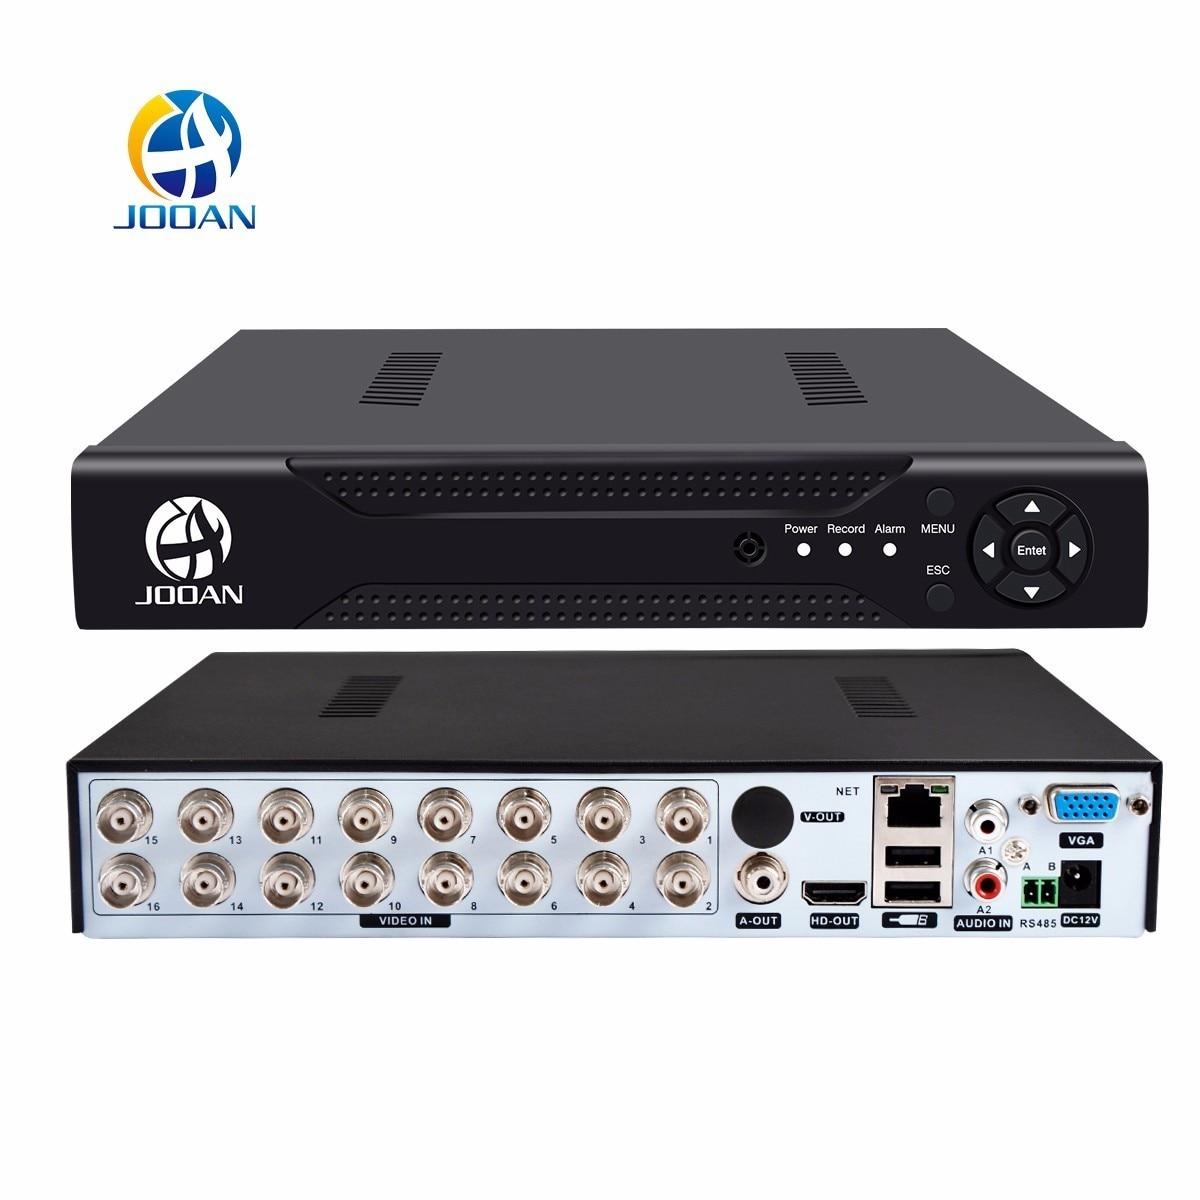 JOOAN 4216T 16CH CCTV DVR H.264 HD-OUT P2P Cloud video recorder home Surveillance security CCTV digital video recorder